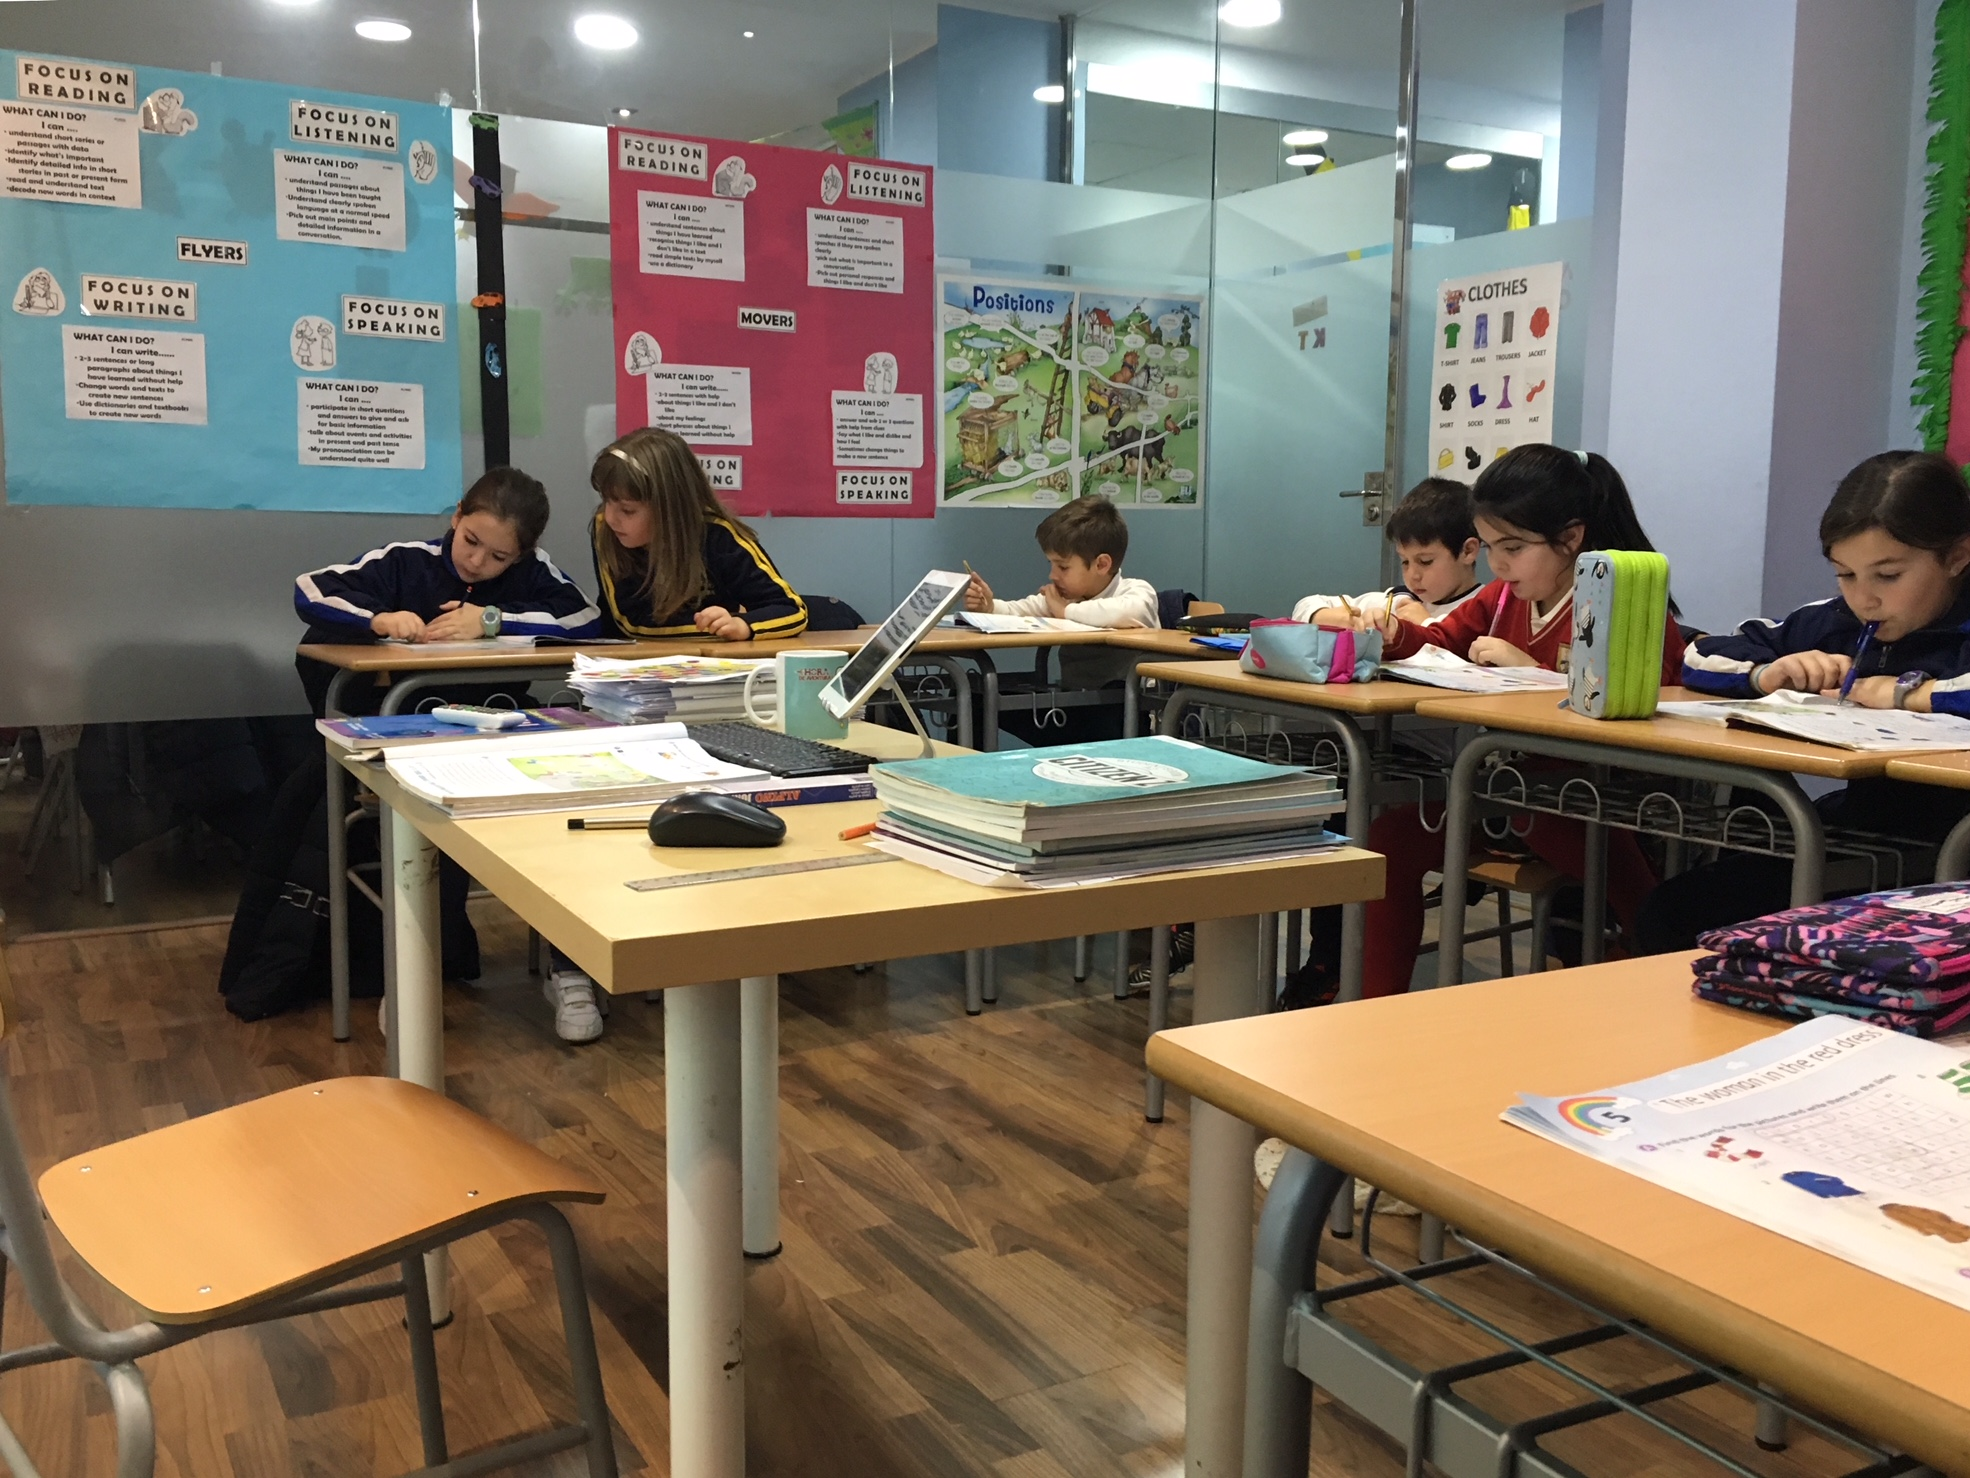 Resumen MOVERS 1 Enero 2018 Centro Ayora